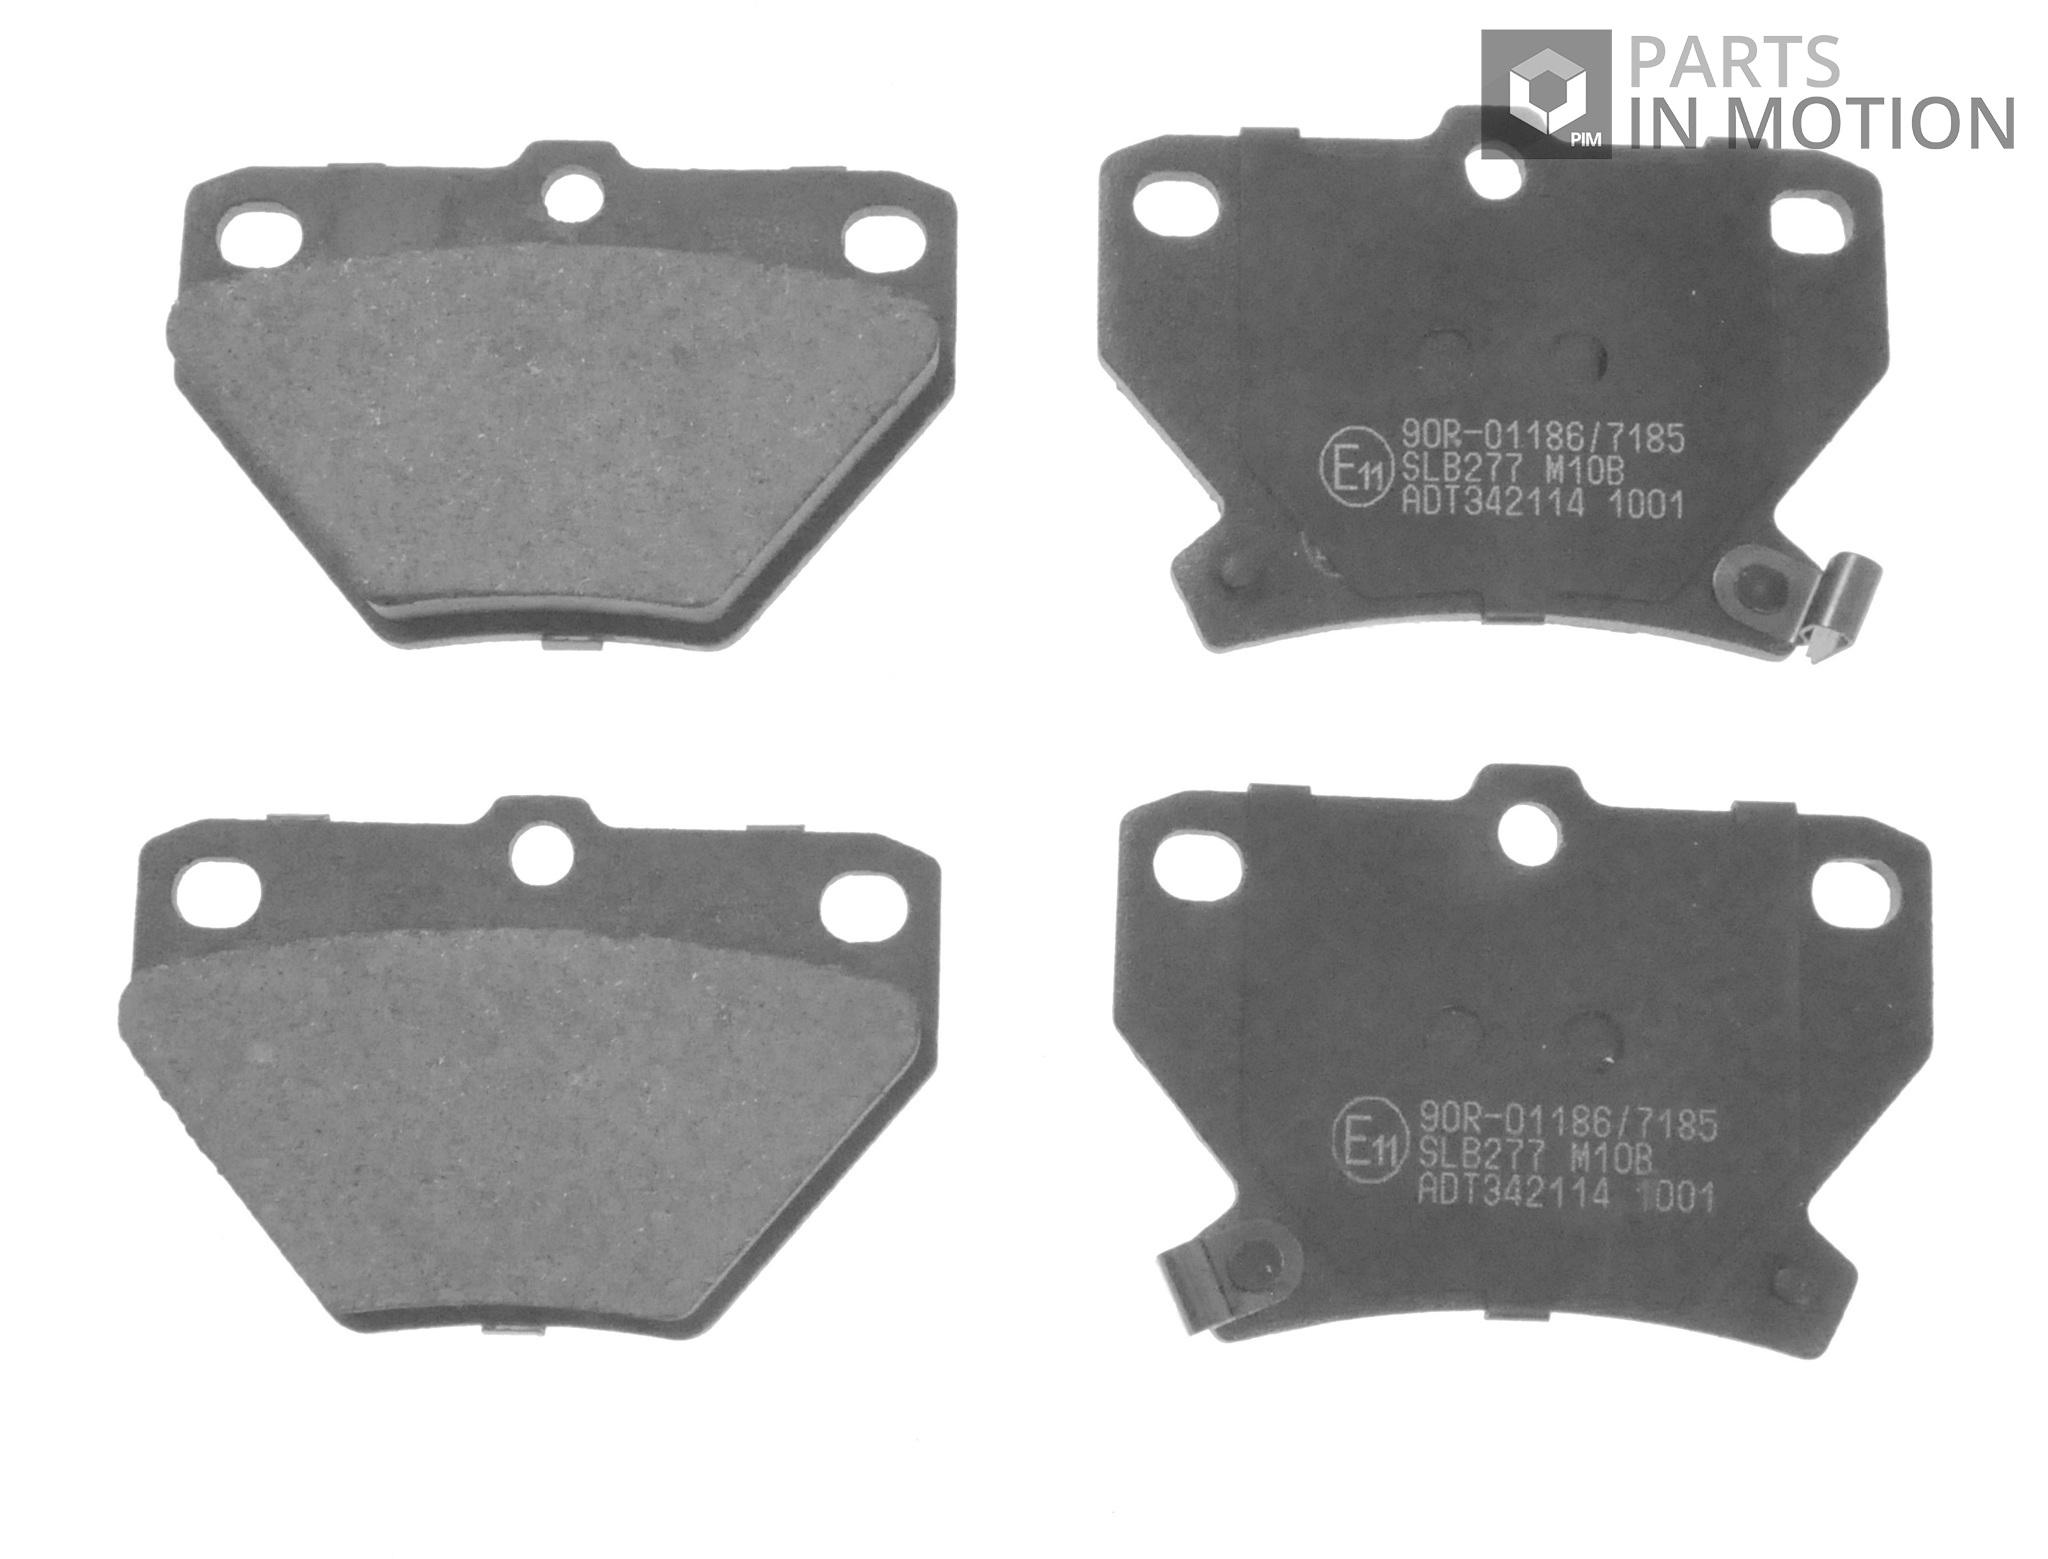 Toyota Prius NHW20 1.5 Genuine Fahren Rear Brake Pads Set